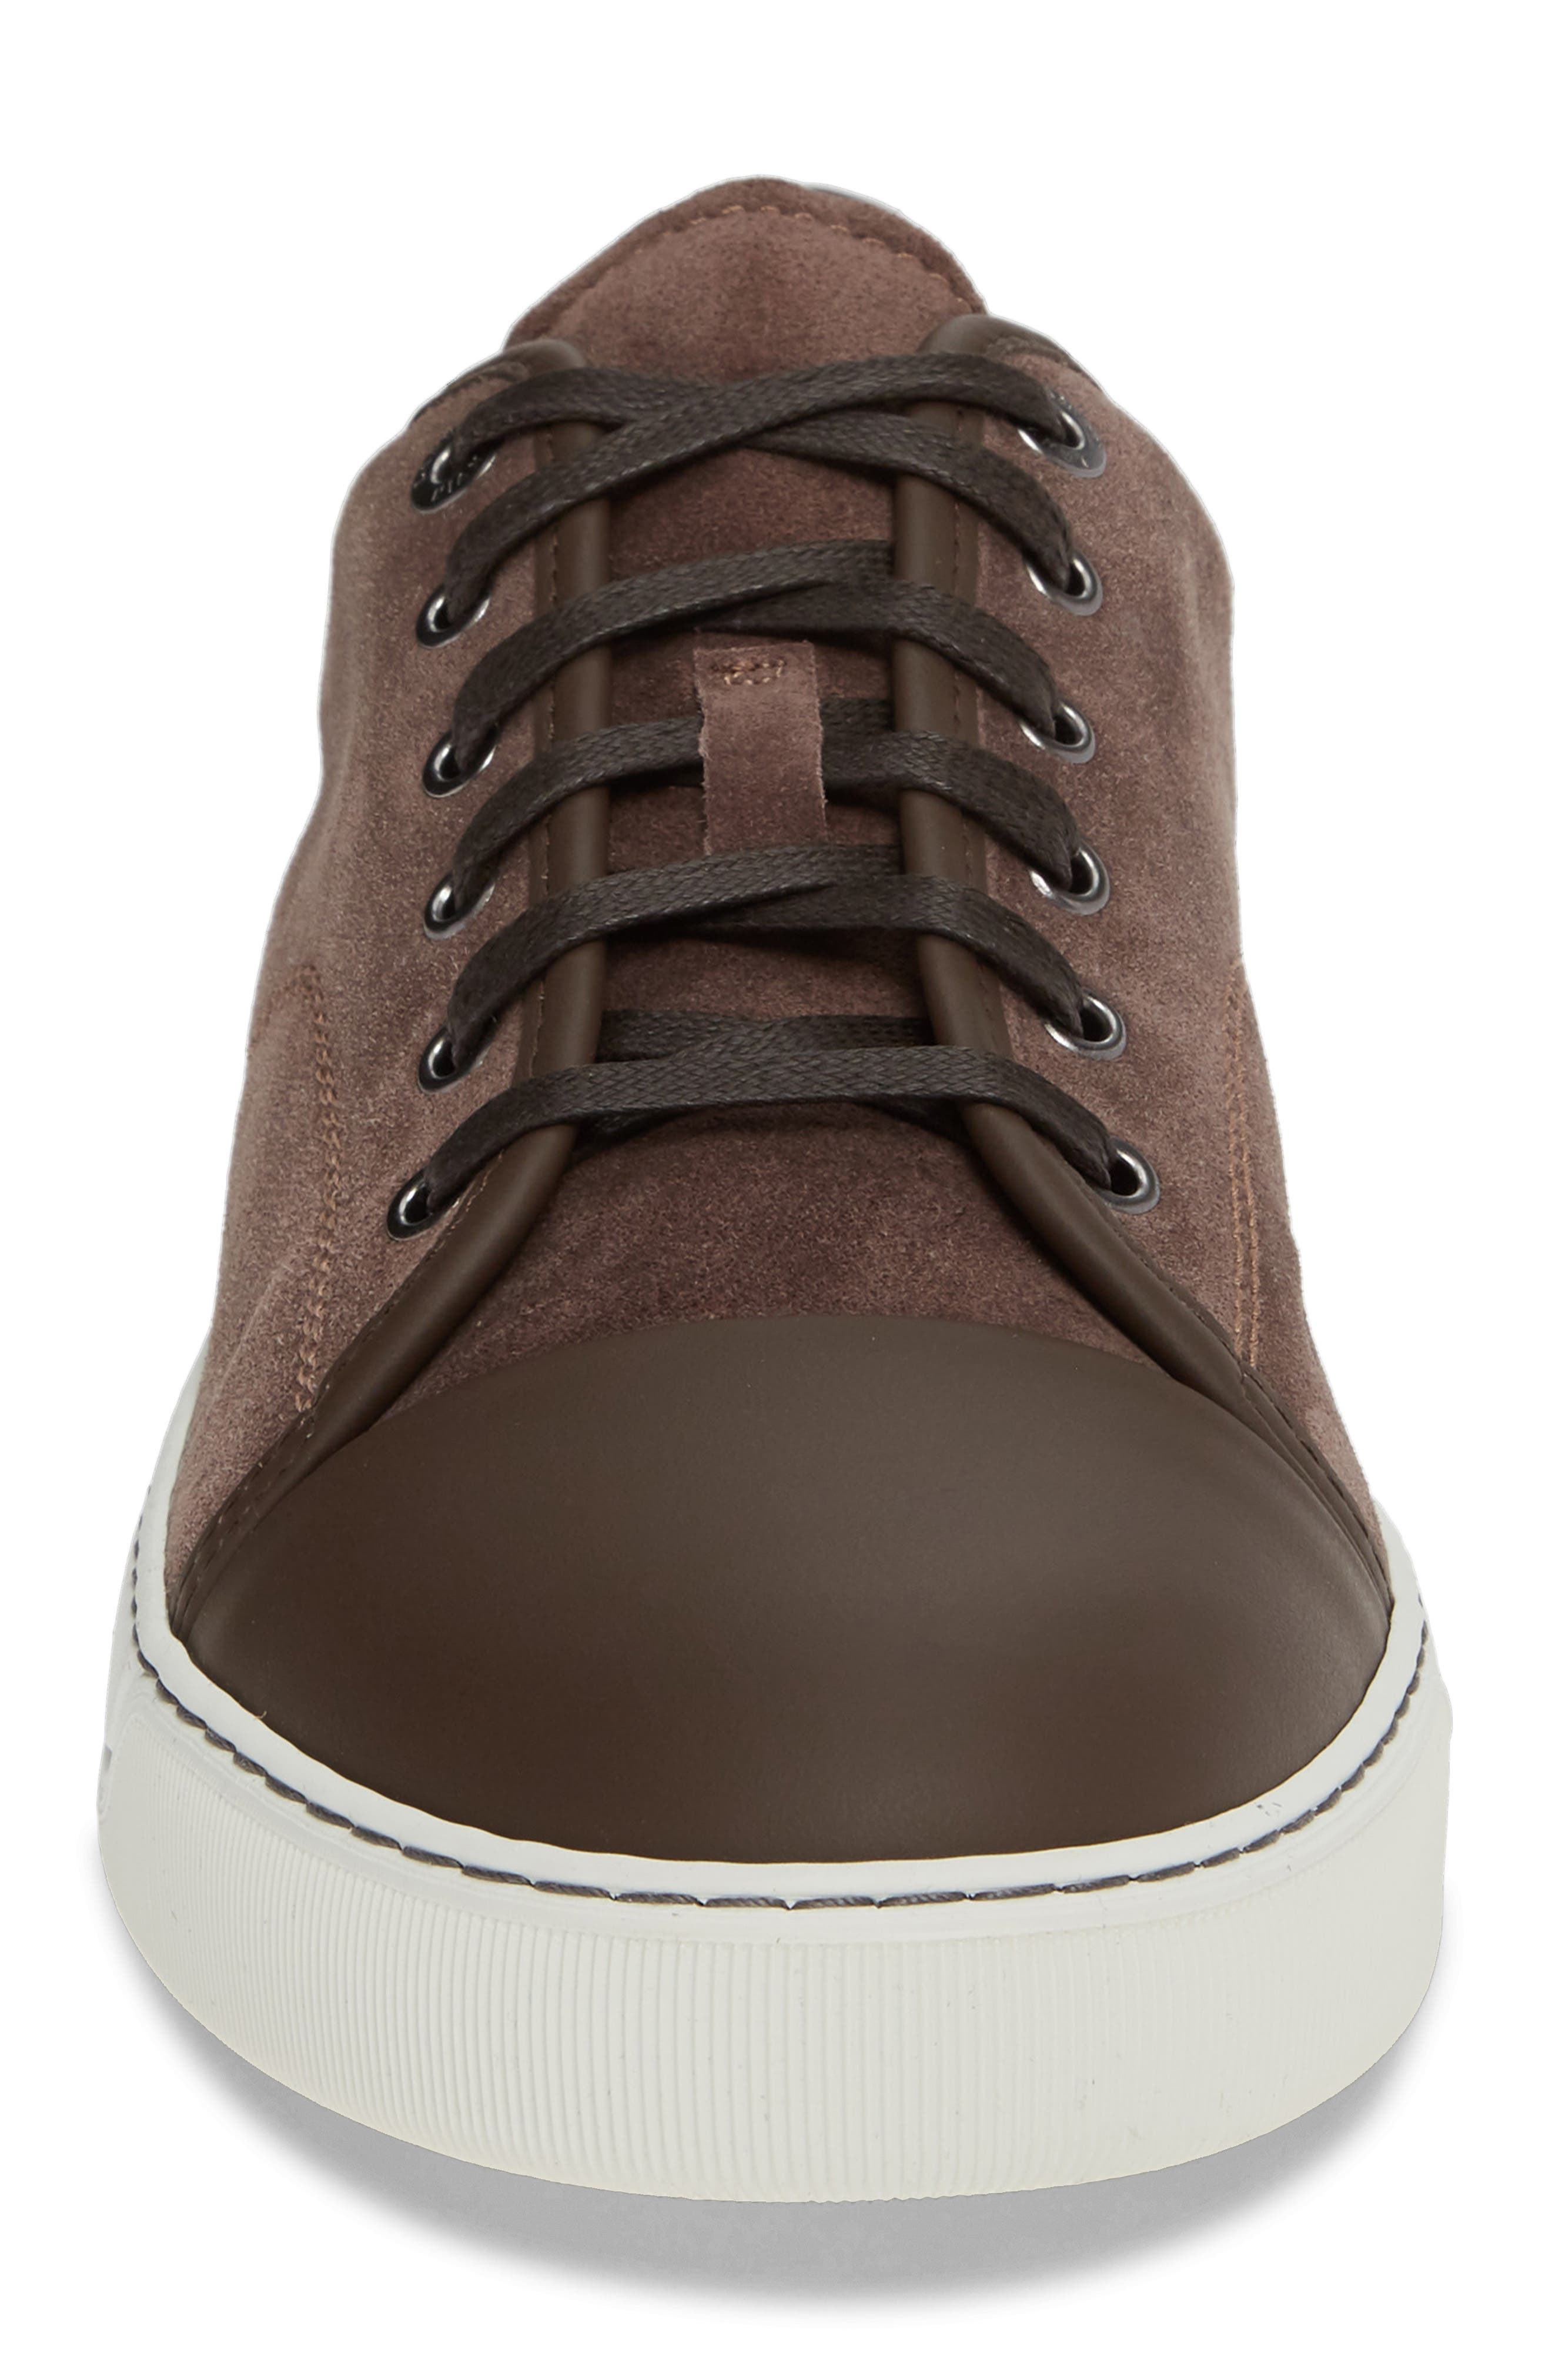 LANVIN, Low Top Sneaker, Alternate thumbnail 4, color, CLAY